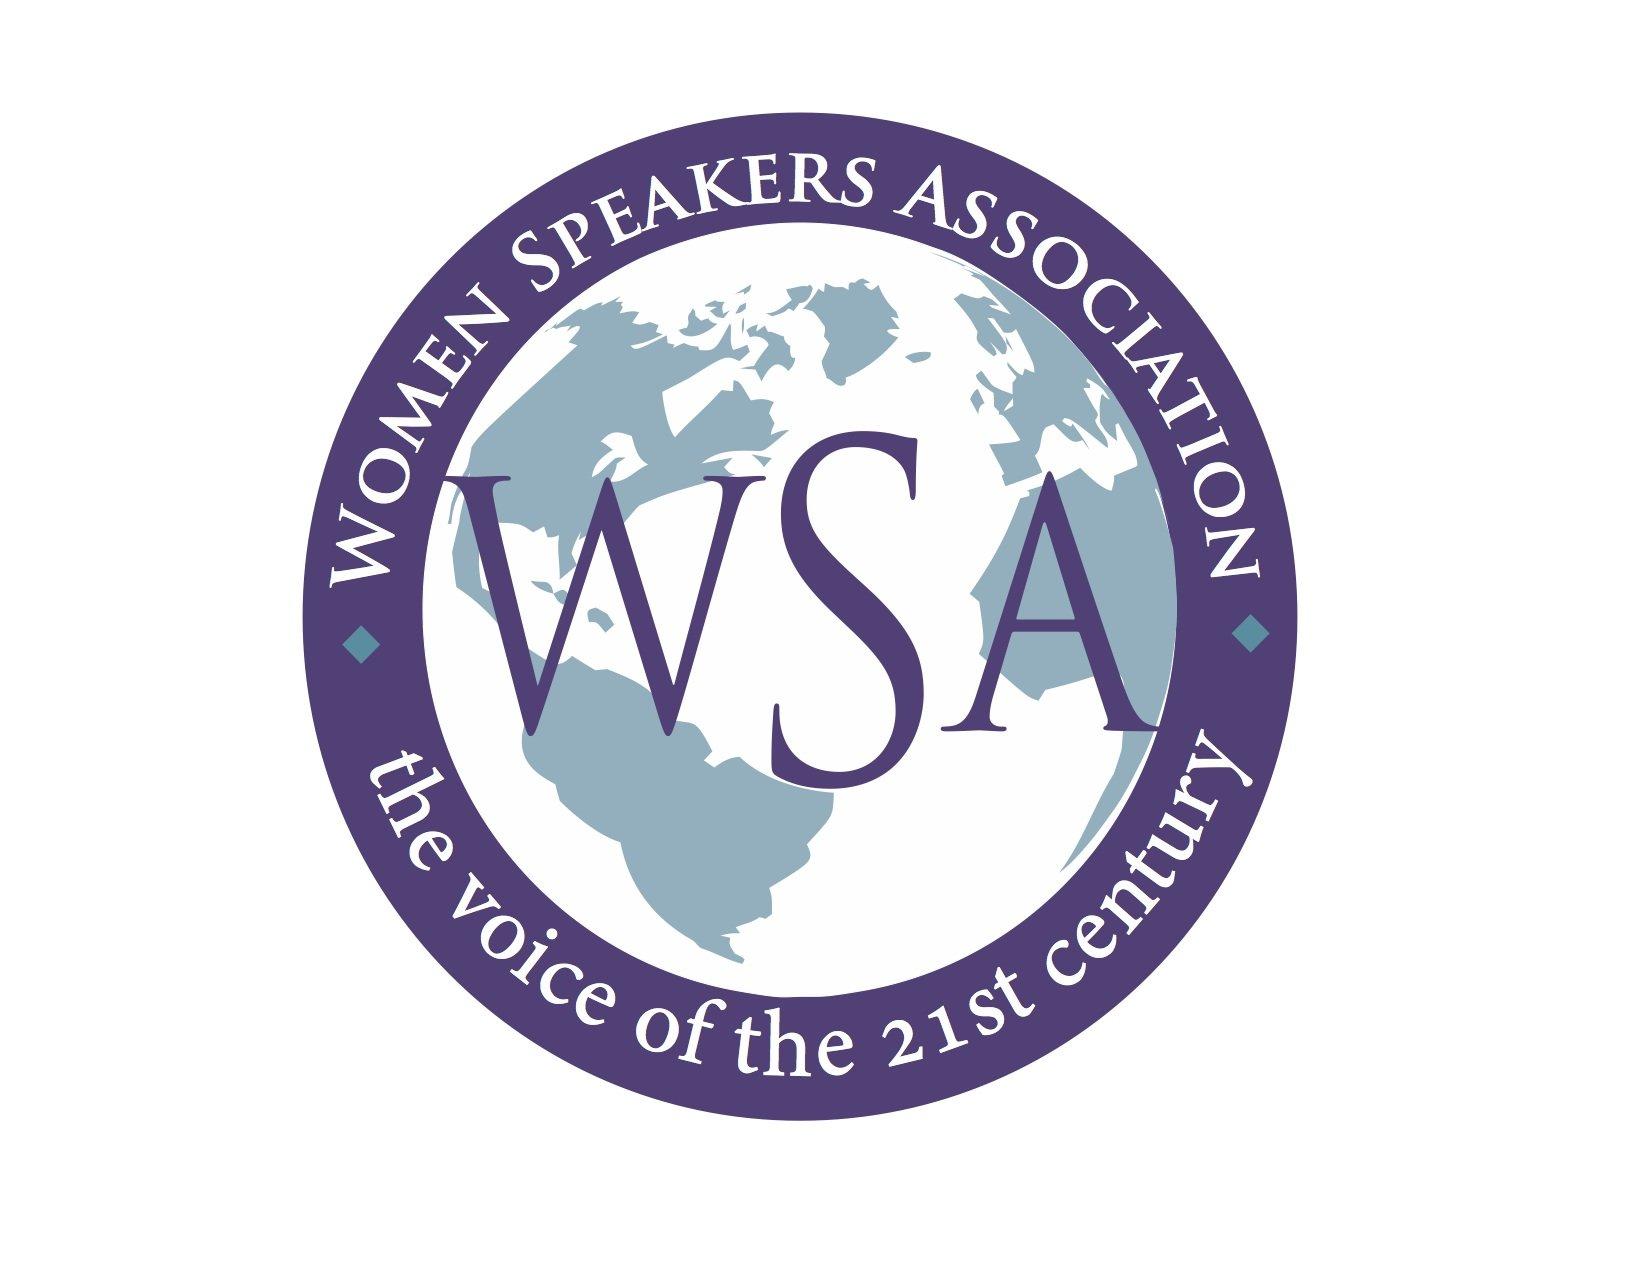 womens speaker association